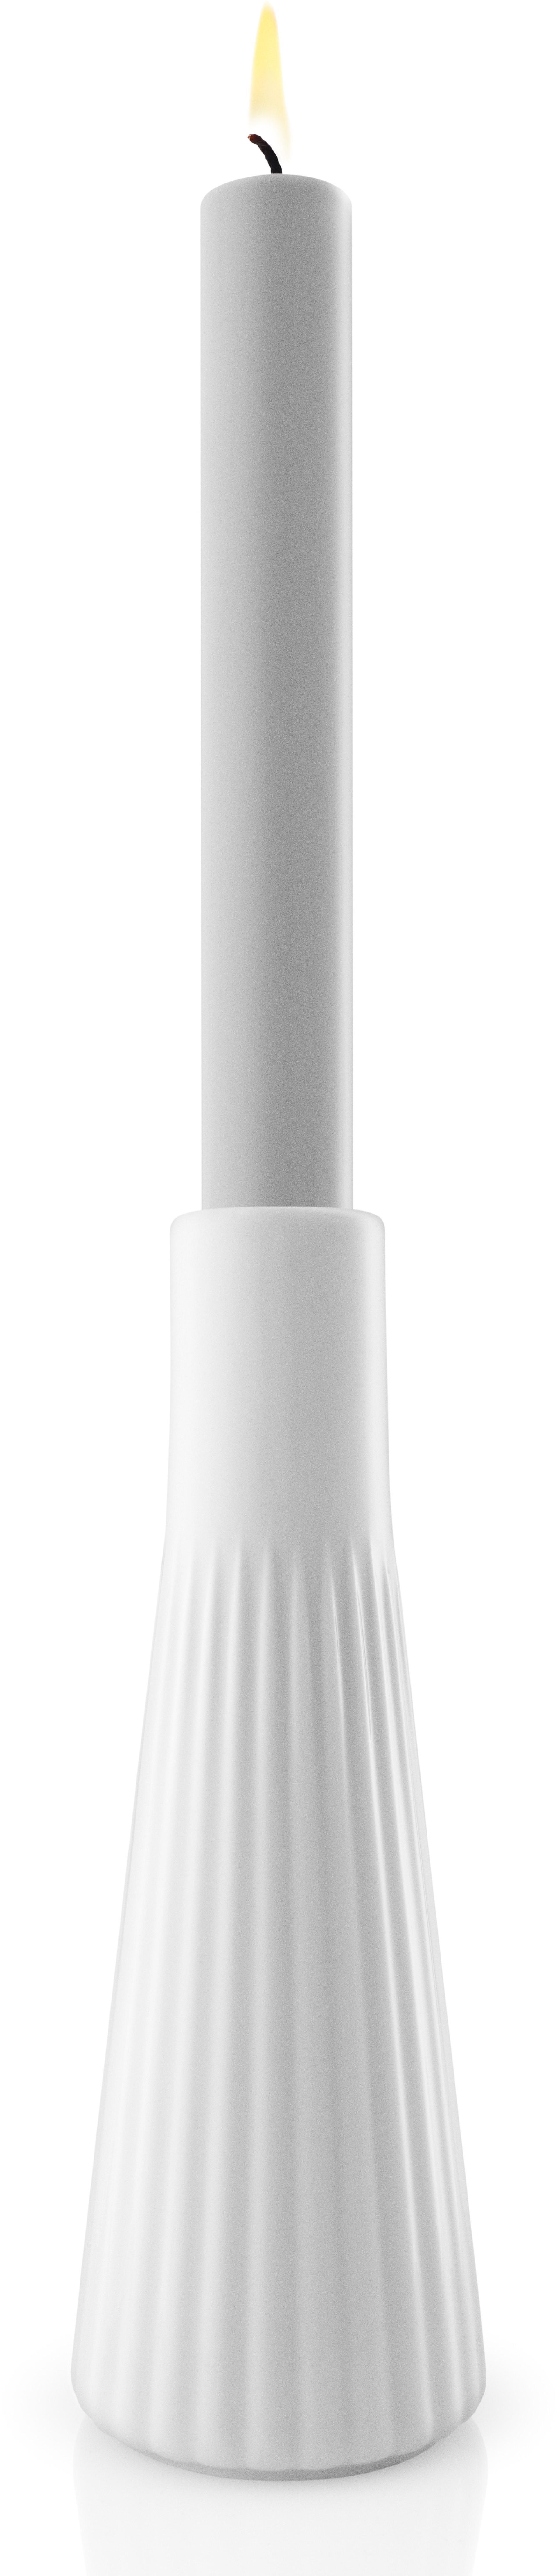 EVA SOLO Svícen Legio Nova bílá 20 cm